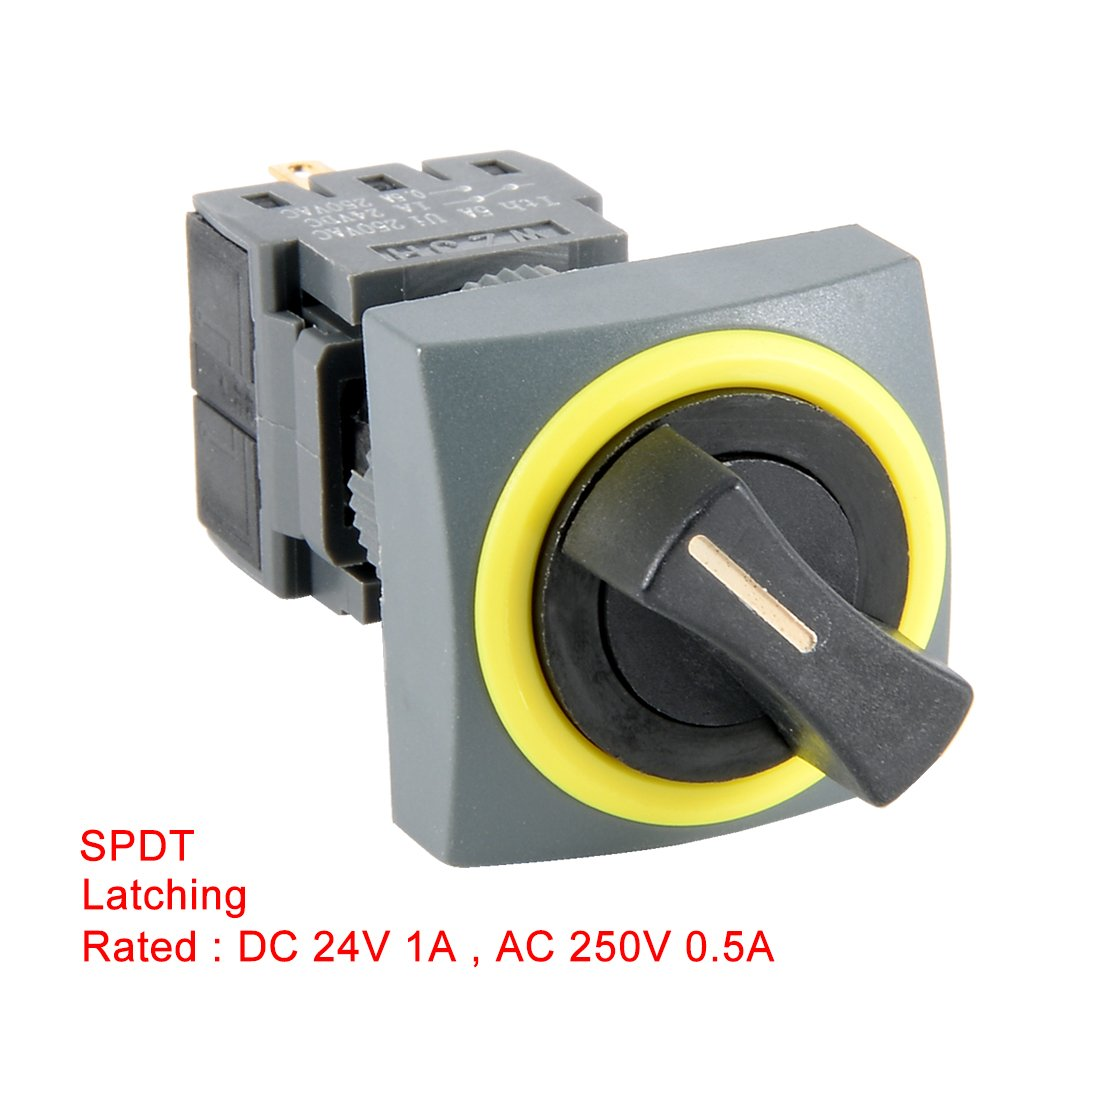 LA38//203 30mm Montaje En Panel N/ÚMERO+NC DPST Posici/ón 2 Interruptor Selector Rotatorio